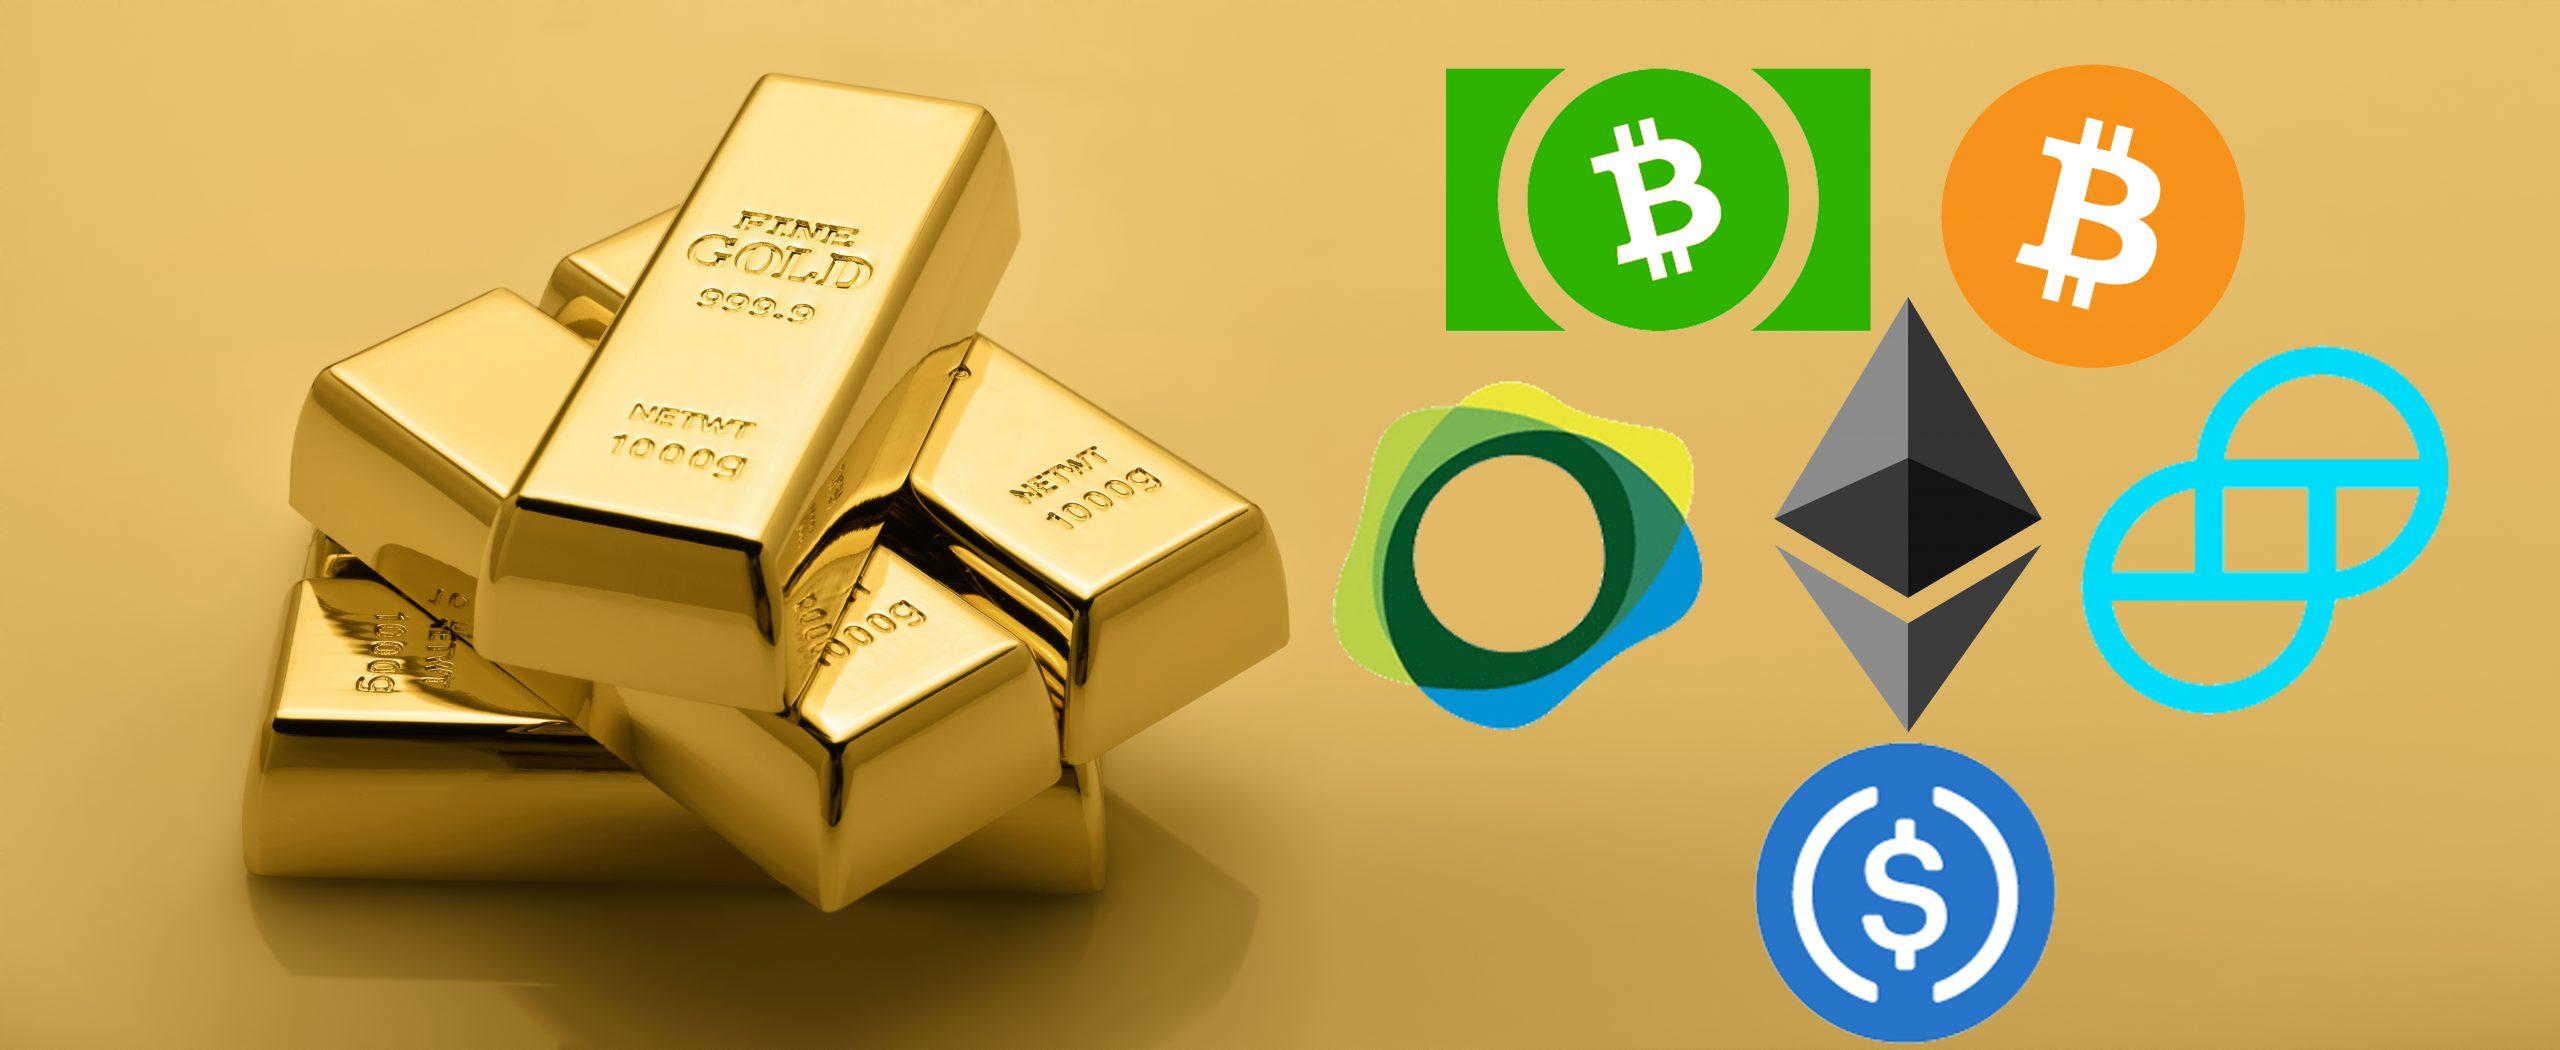 "El mercado de lingotes en línea Onegold ve $ 50 millones en criptopagos ""width ="" 2560 ""height ="" 1050 ""srcset = ""https://blackswanfinances.com/wp-content/uploads/2020/01/bitpayonegold-scaled.jpg 2560w, https://news.bitcoin.com/wp-content/uploads/2020/01/bitpayonegold -300x123.jpg 300w, https://news.bitcoin.com/wp-content/uploads/2020/01/bitpayonegold-1024x420.jpg 1024w, https://news.bitcoin.com/wp-content/uploads/2020 /01/bitpayonegold-768x315.jpg 768w, https://news.bitcoin.com/wp-content/uploads/2020/01/bitpayonegold-1536x630.jpg 1536w, https://news.bitcoin.com/wp-content /uploads/2020/01/bitpayonegold-2048x840.jpg 2048w, https://news.bitcoin.com/wp-content/uploads/2020/01/bitpayonegold-696x285.jpg 696w, https://news.bitcoin.com /wp-content/uploads/2020/01/bitpayonegold-1392x571.jpg 1392w, https://news.bitcoin.com/wp-content/uploads/2020/01/bitpay onegold-1068x438.jpg 1068w, https://news.bitcoin.com/wp-content/uploads/2020/01/bitpayonegold-1920x788.jpg 1920w ""tamaños ="" (ancho máximo: 2560px) 100vw, 2560px"